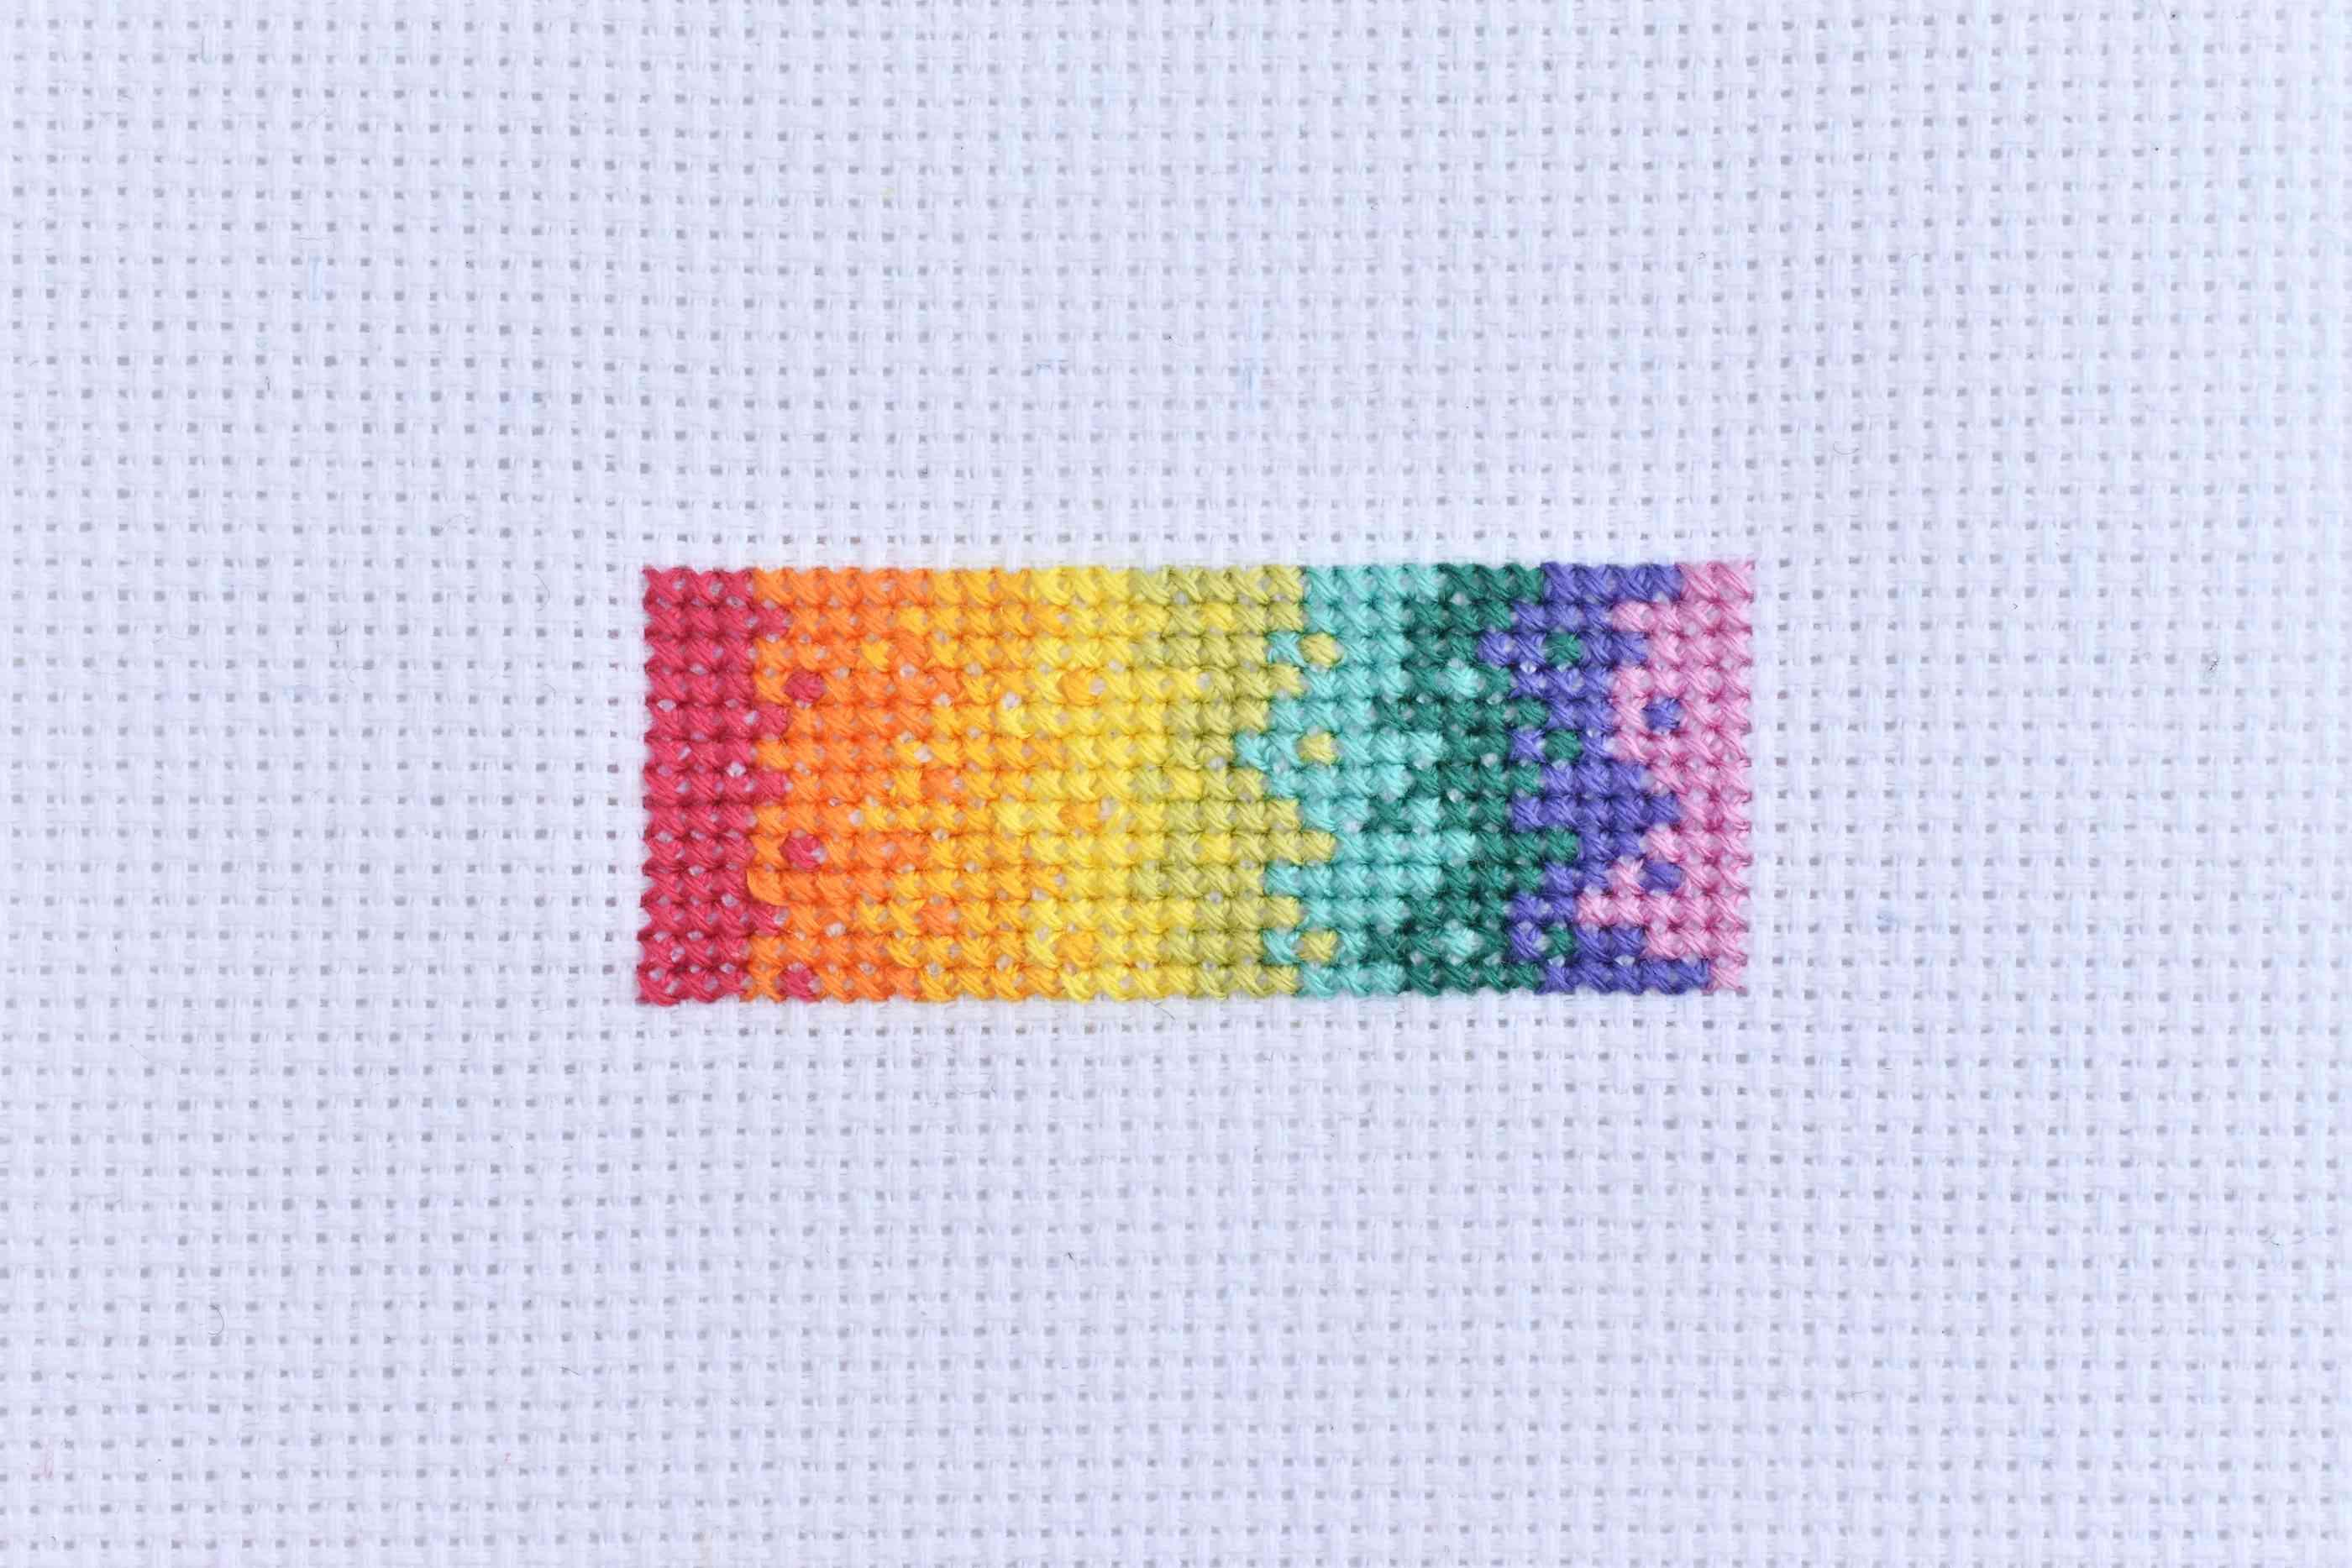 Cross Stitch Sample in a Rainbow Spectrum